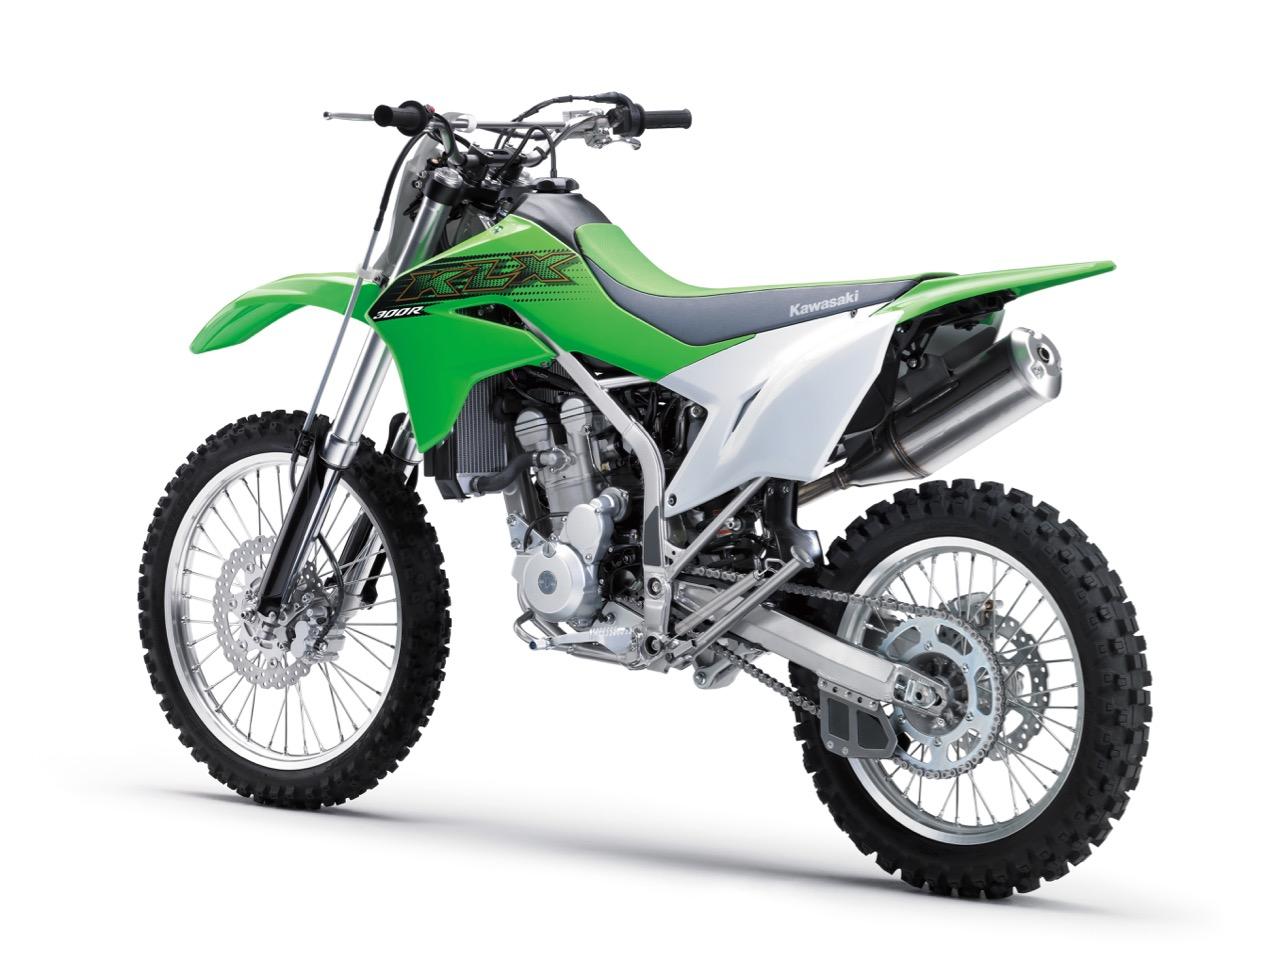 2020 Kawasaki Off-Road Models Revealed, new KLX300R